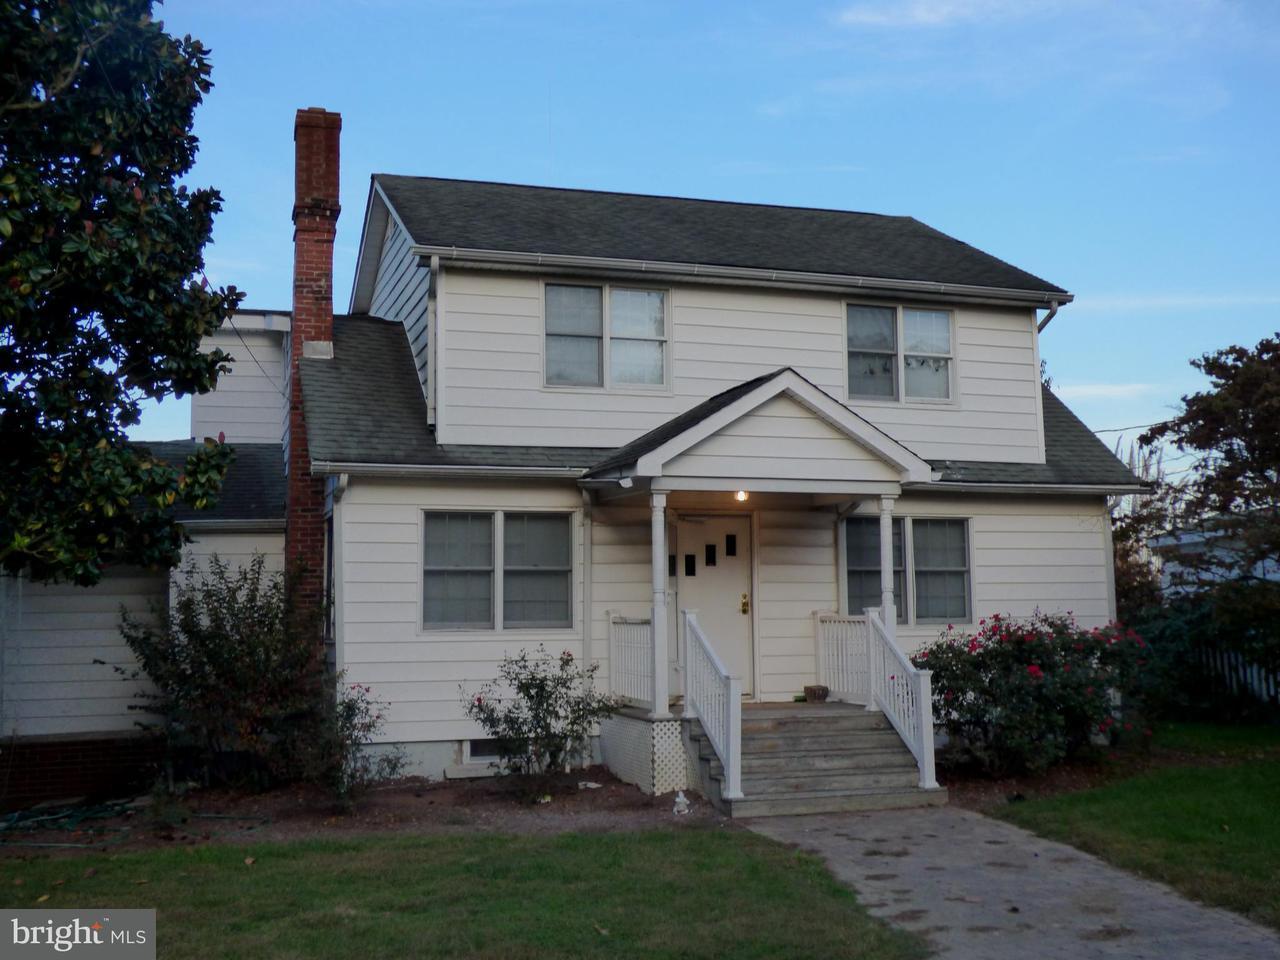 Casa Unifamiliar por un Venta en 14324 Calvert Street 14324 Calvert Street Solomons, Maryland 20688 Estados Unidos